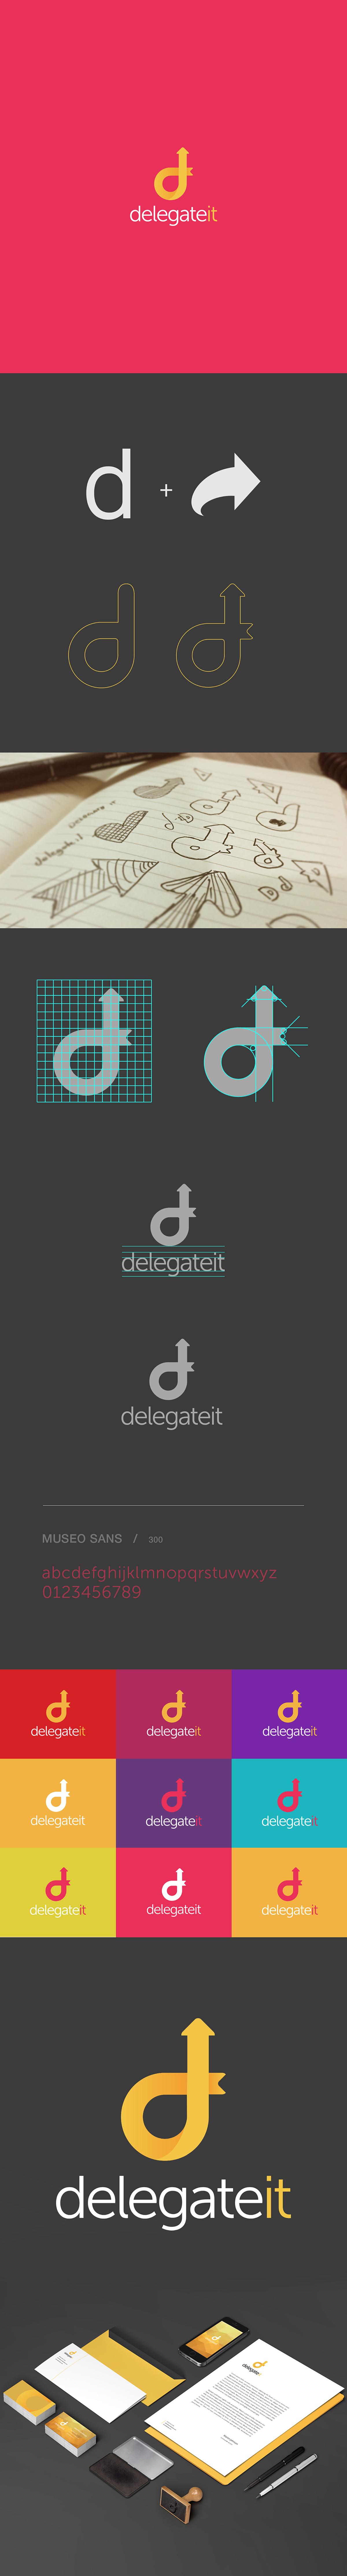 delegateit Illustrator geometry